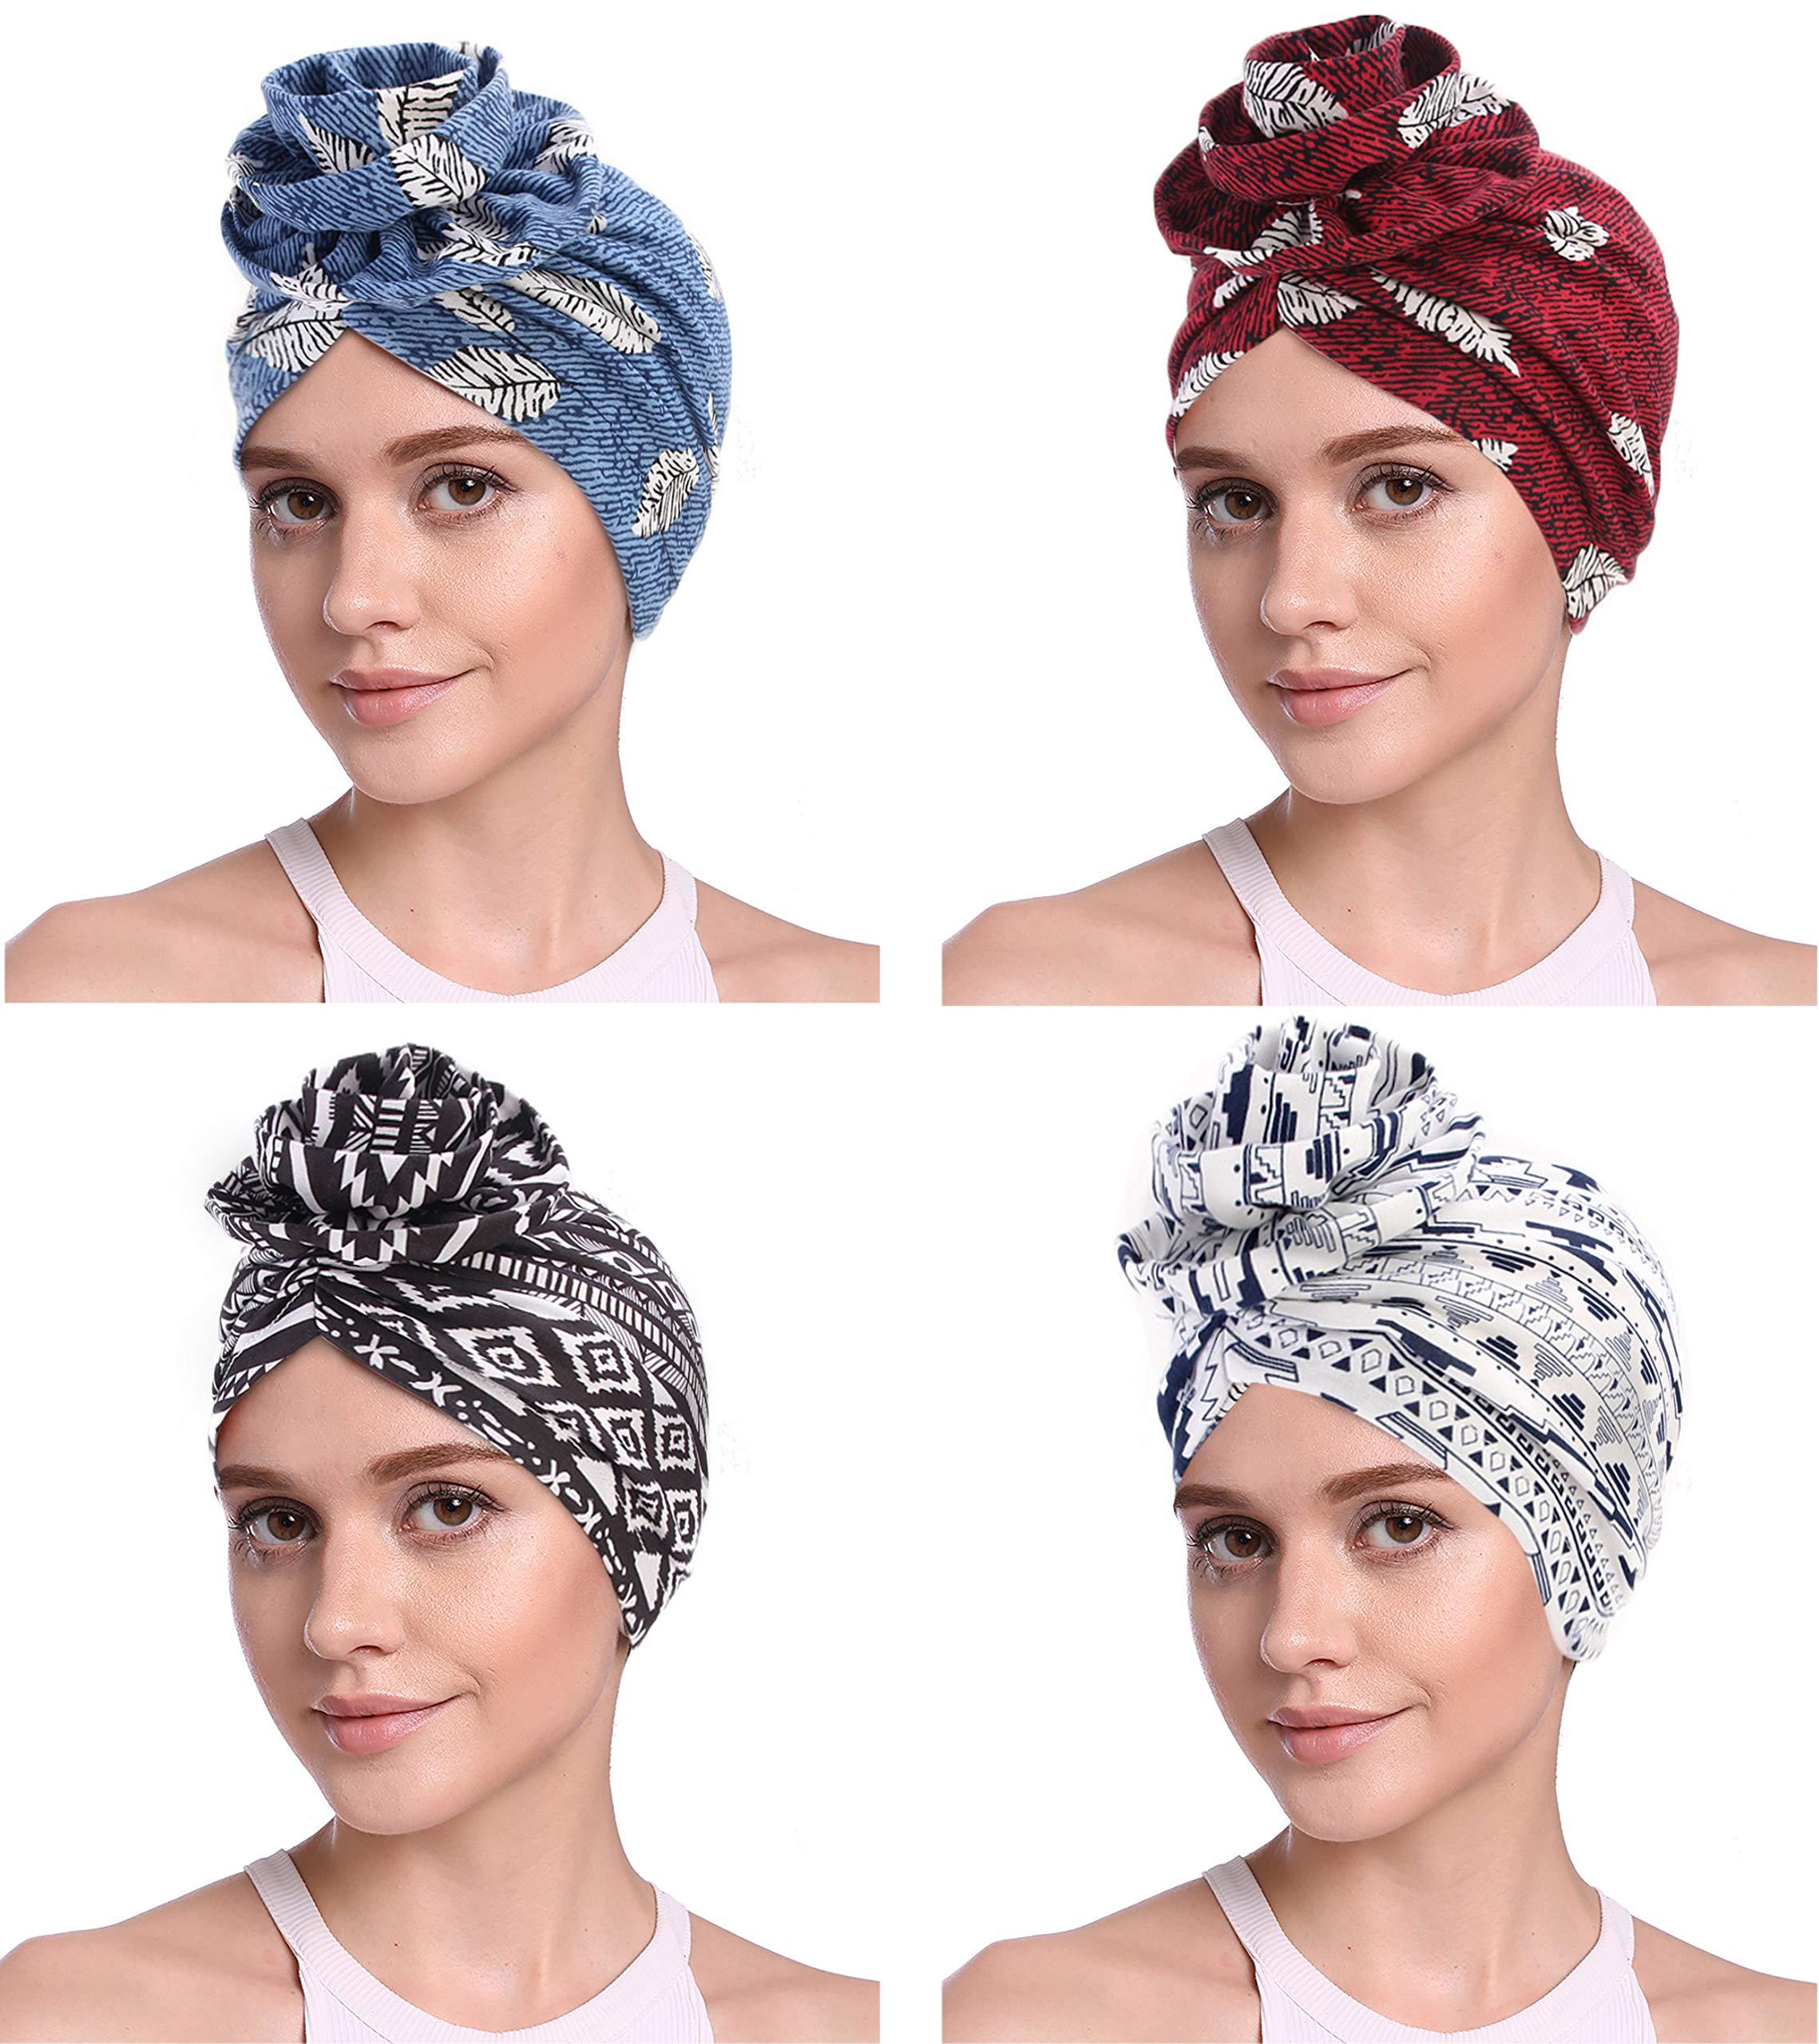 JarseHera Cotton Turbans for Women Flower Knot Headwrap Pre-Tied Bonnet Boho Pattern Chemo caps for Hair Loss by JarseHera